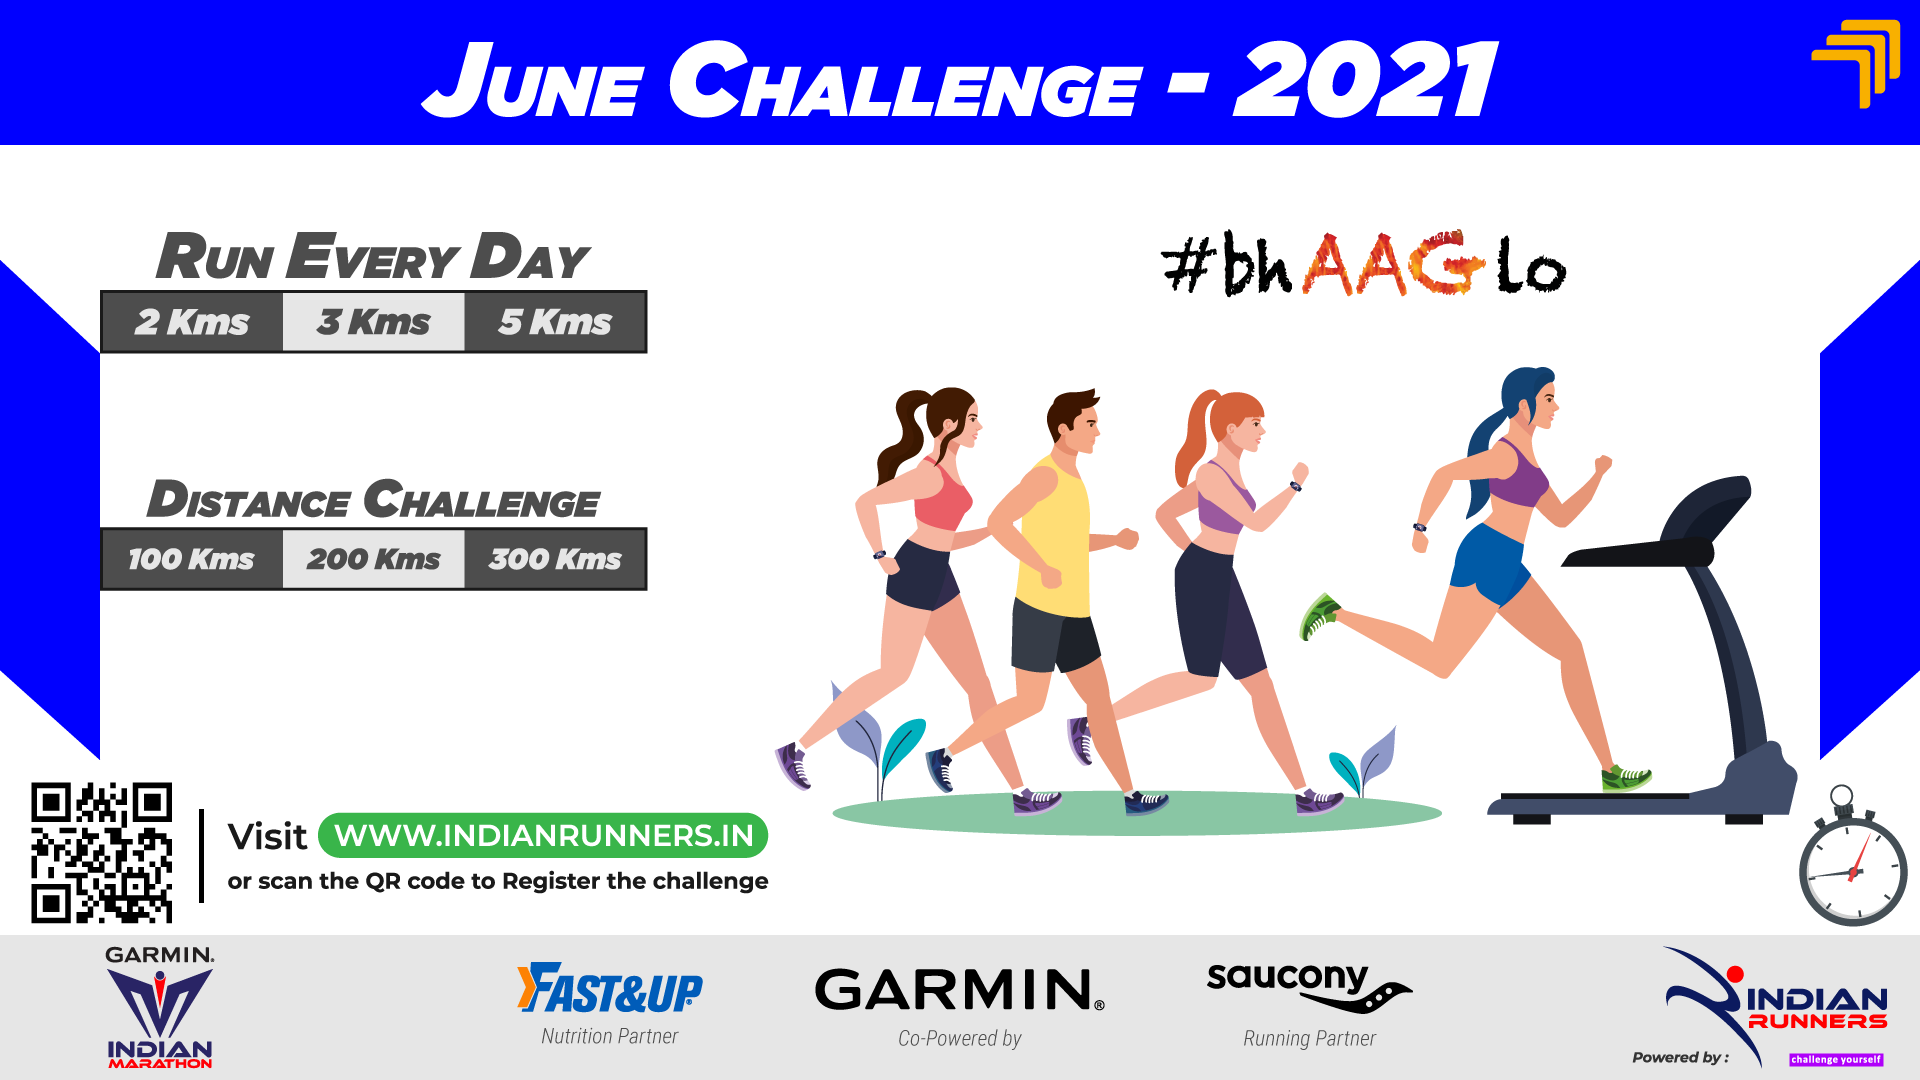 July Running Challenge 2021 image